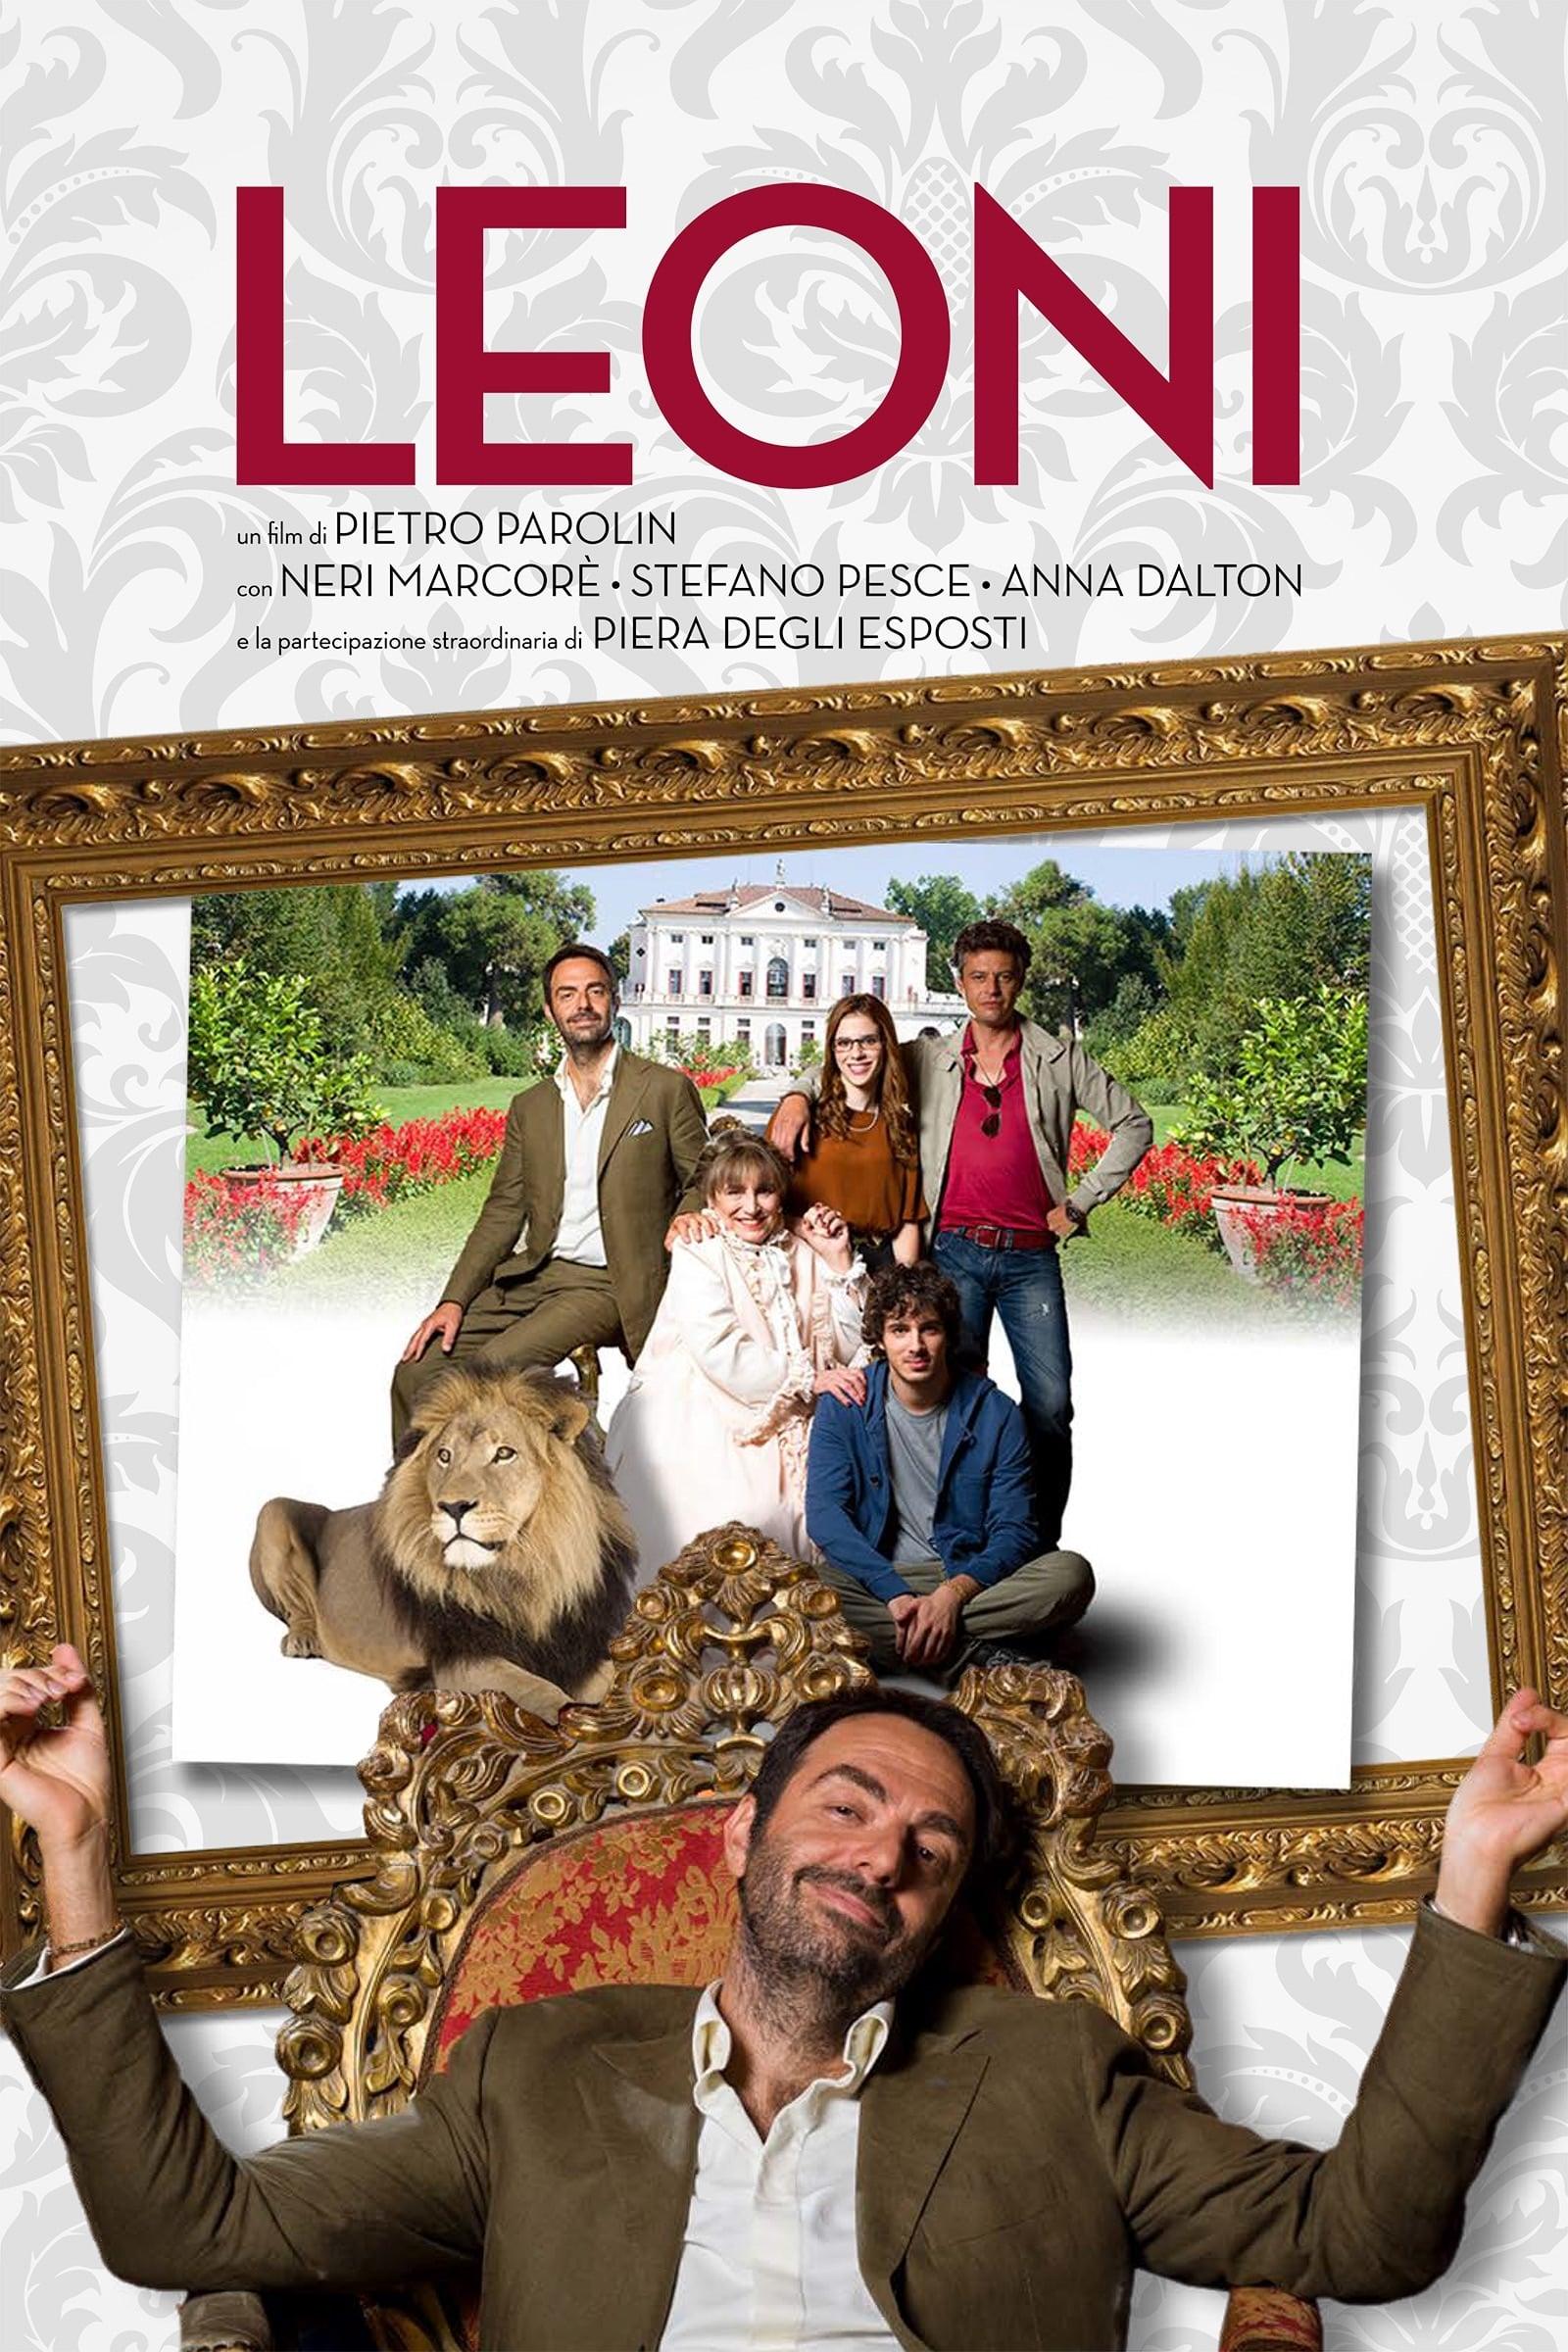 Leoni poster